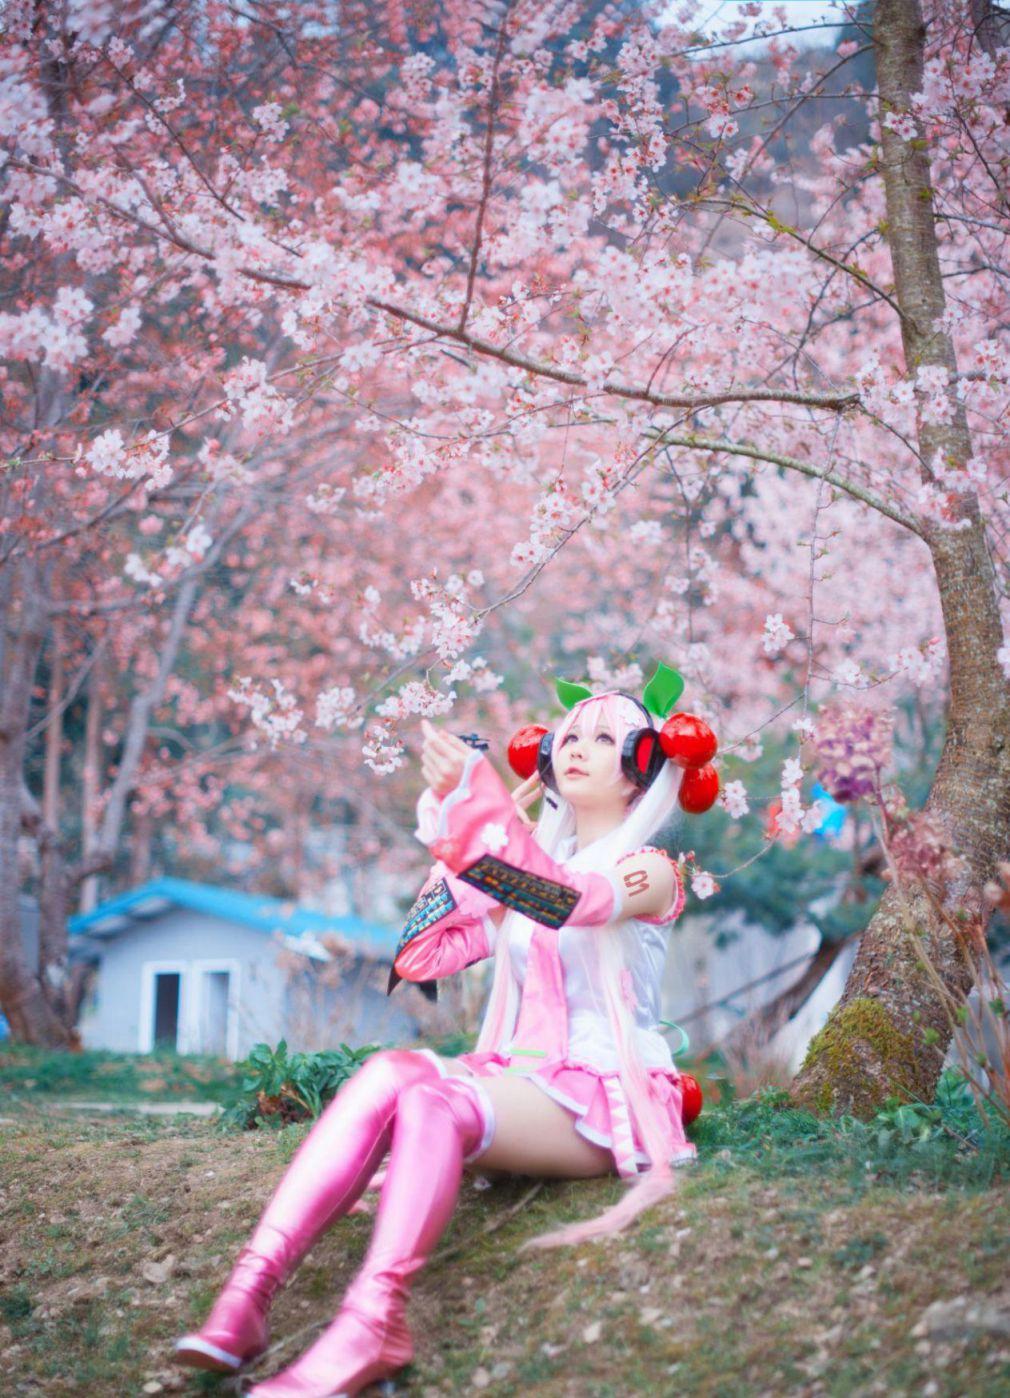 【Cosplay】动漫cosplay女装2019-01-06-小柚妹站